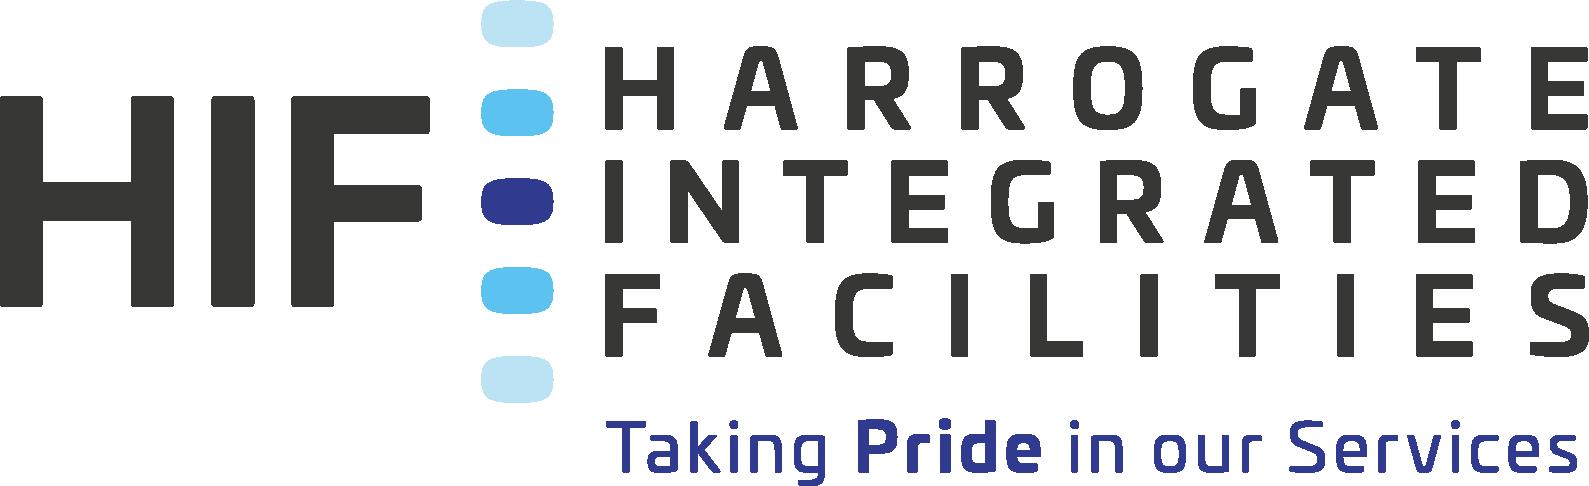 HIF Harrogate Integrated Facilities